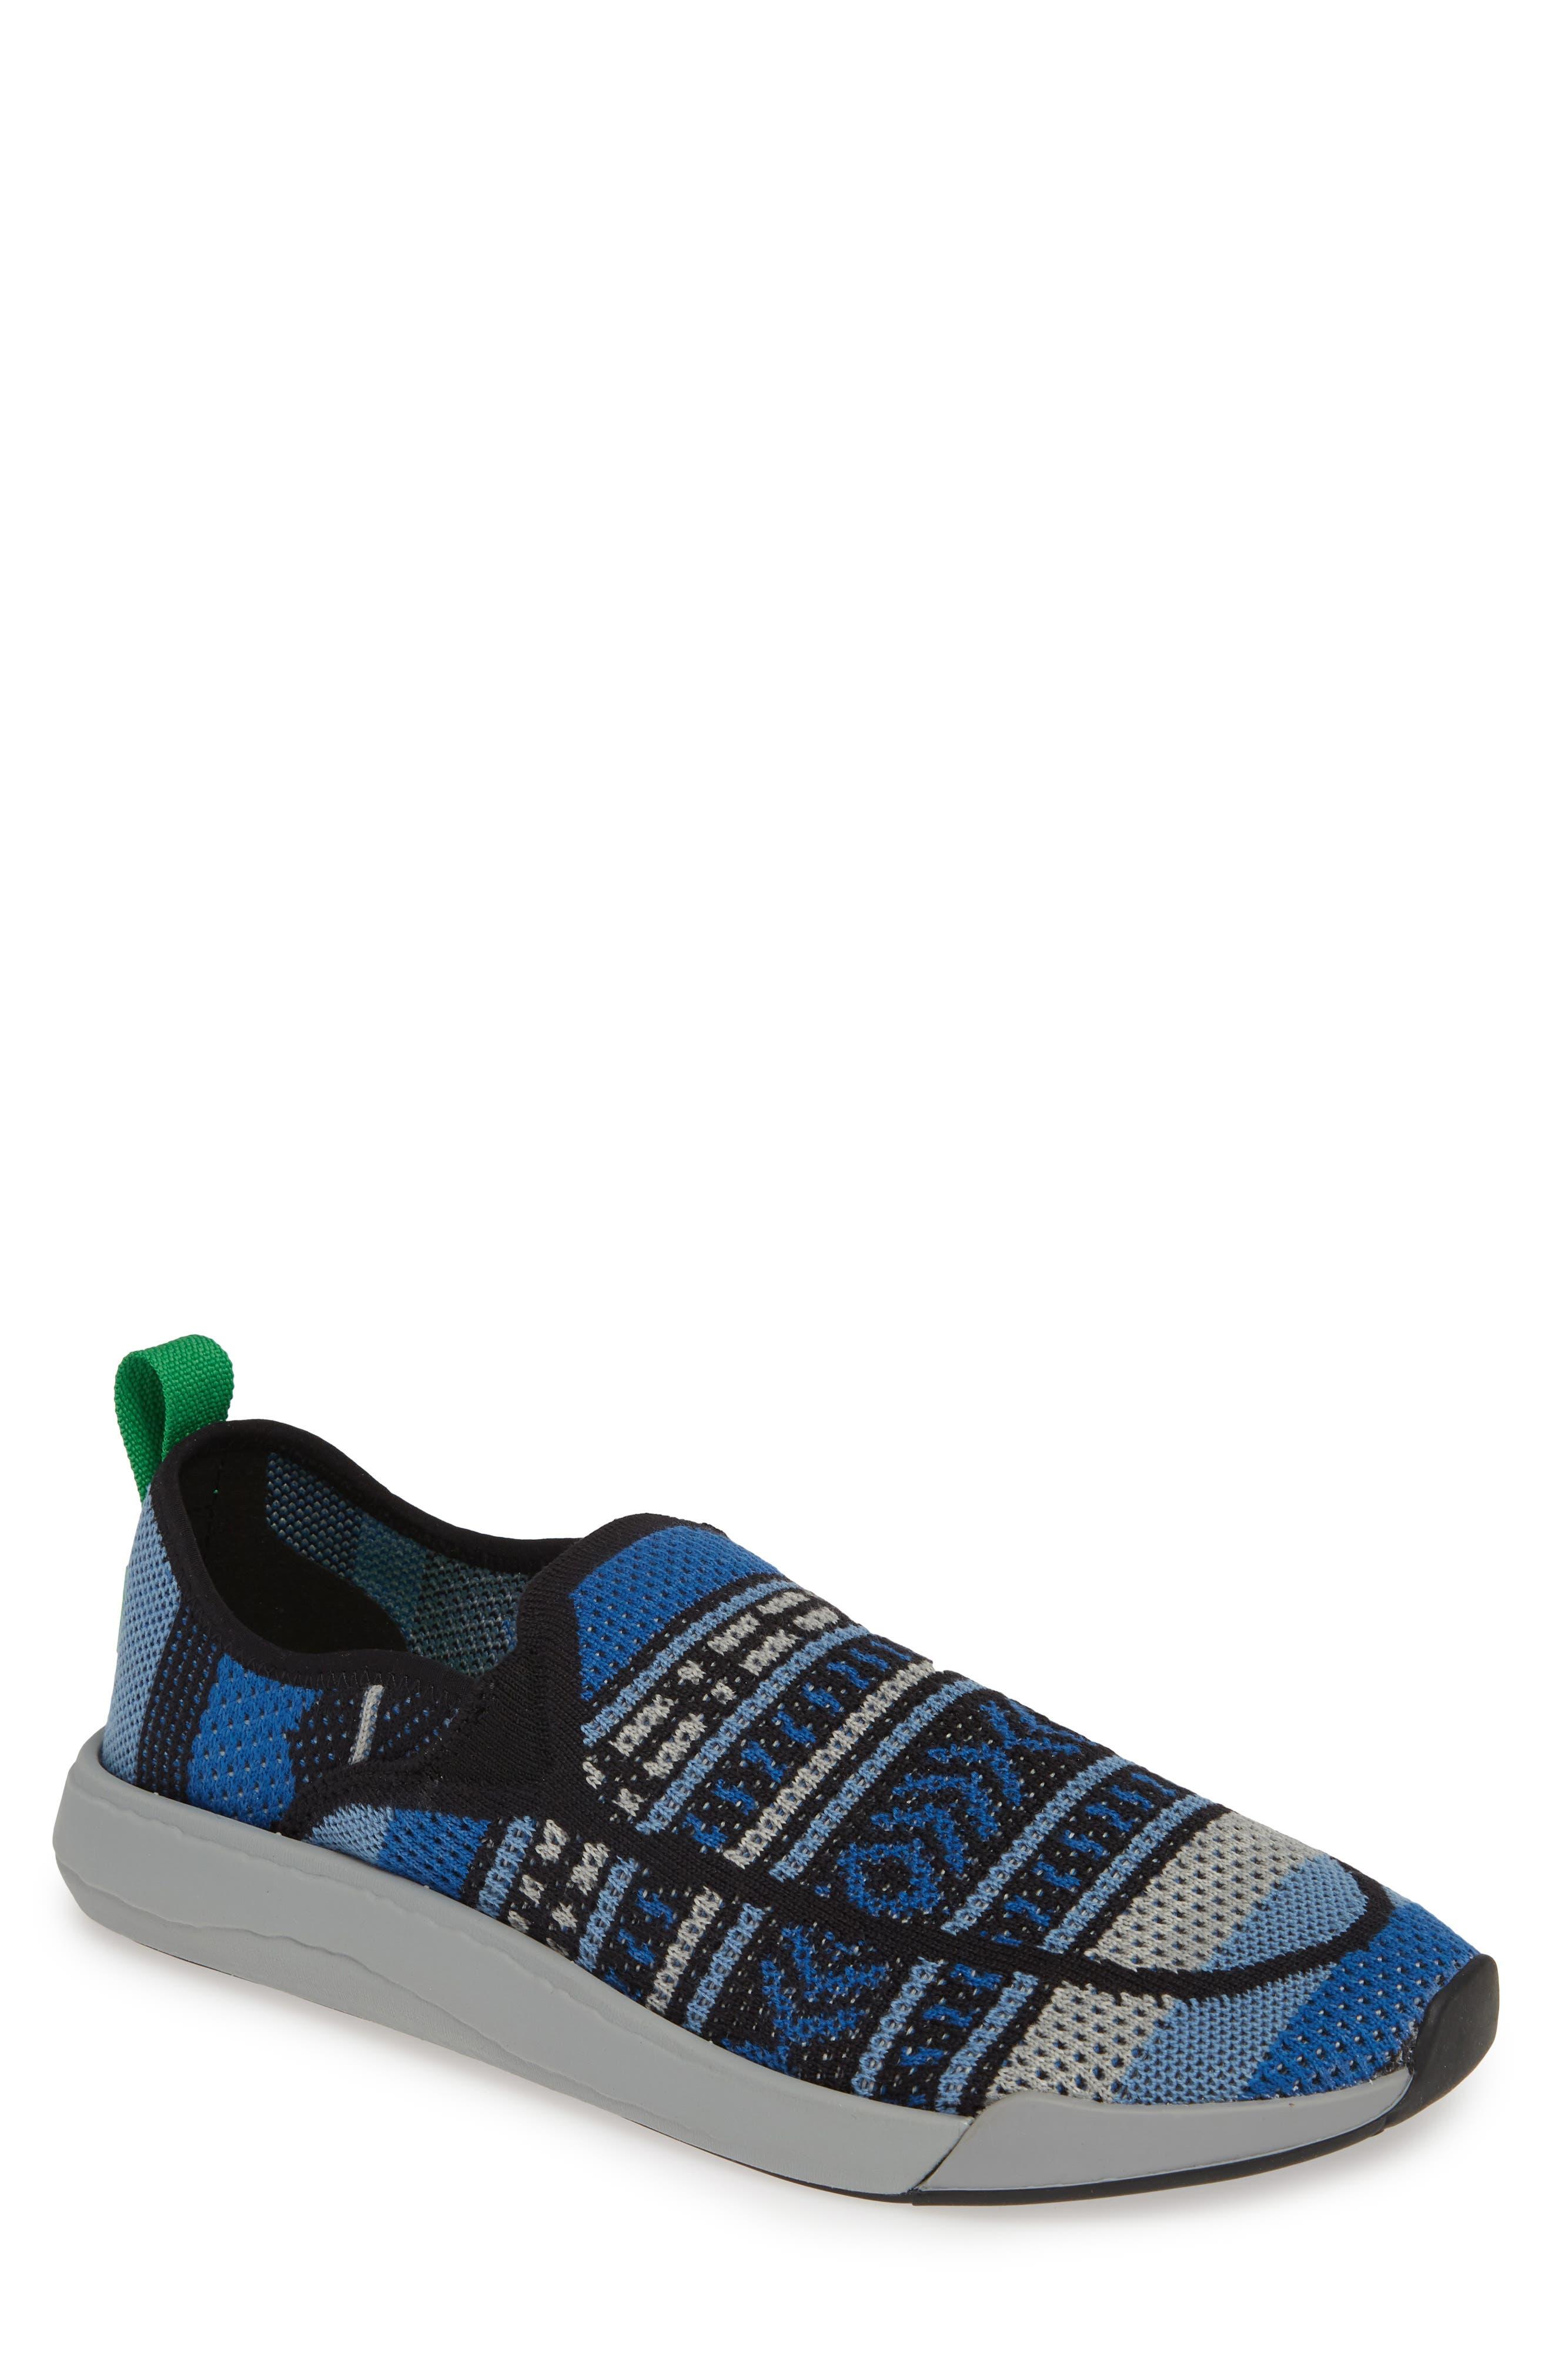 Sanuk Chiba Quest Knit Slip-On Sneaker, Blue